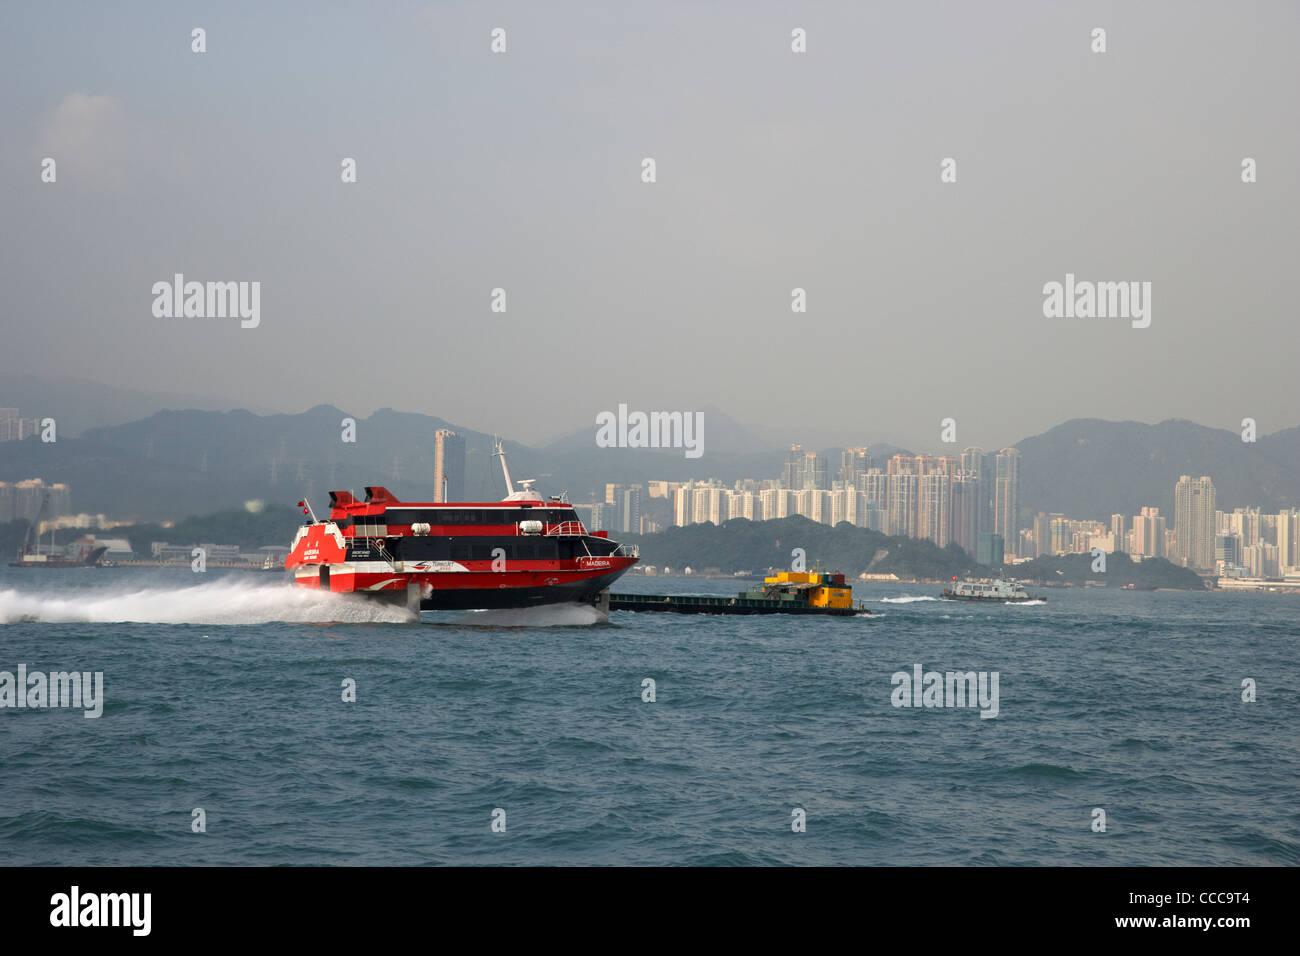 Madeira hydrofoil Ferry Macao cruza belchers bay en puerto Victoria de Hong Kong RAE china asia Imagen De Stock